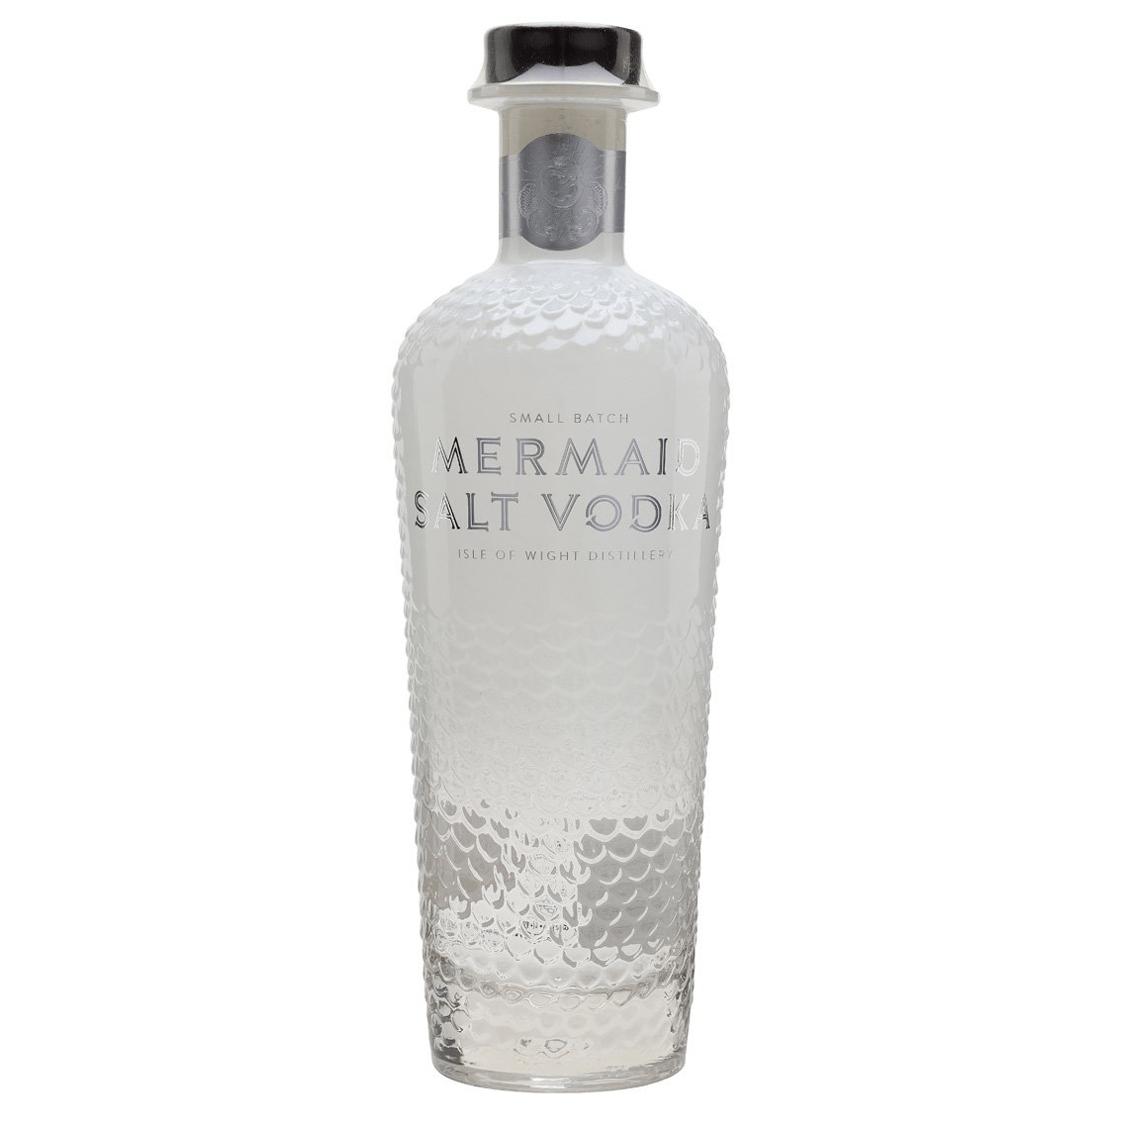 Mermaid Salt Vodka - Shop The Bar - Female Original